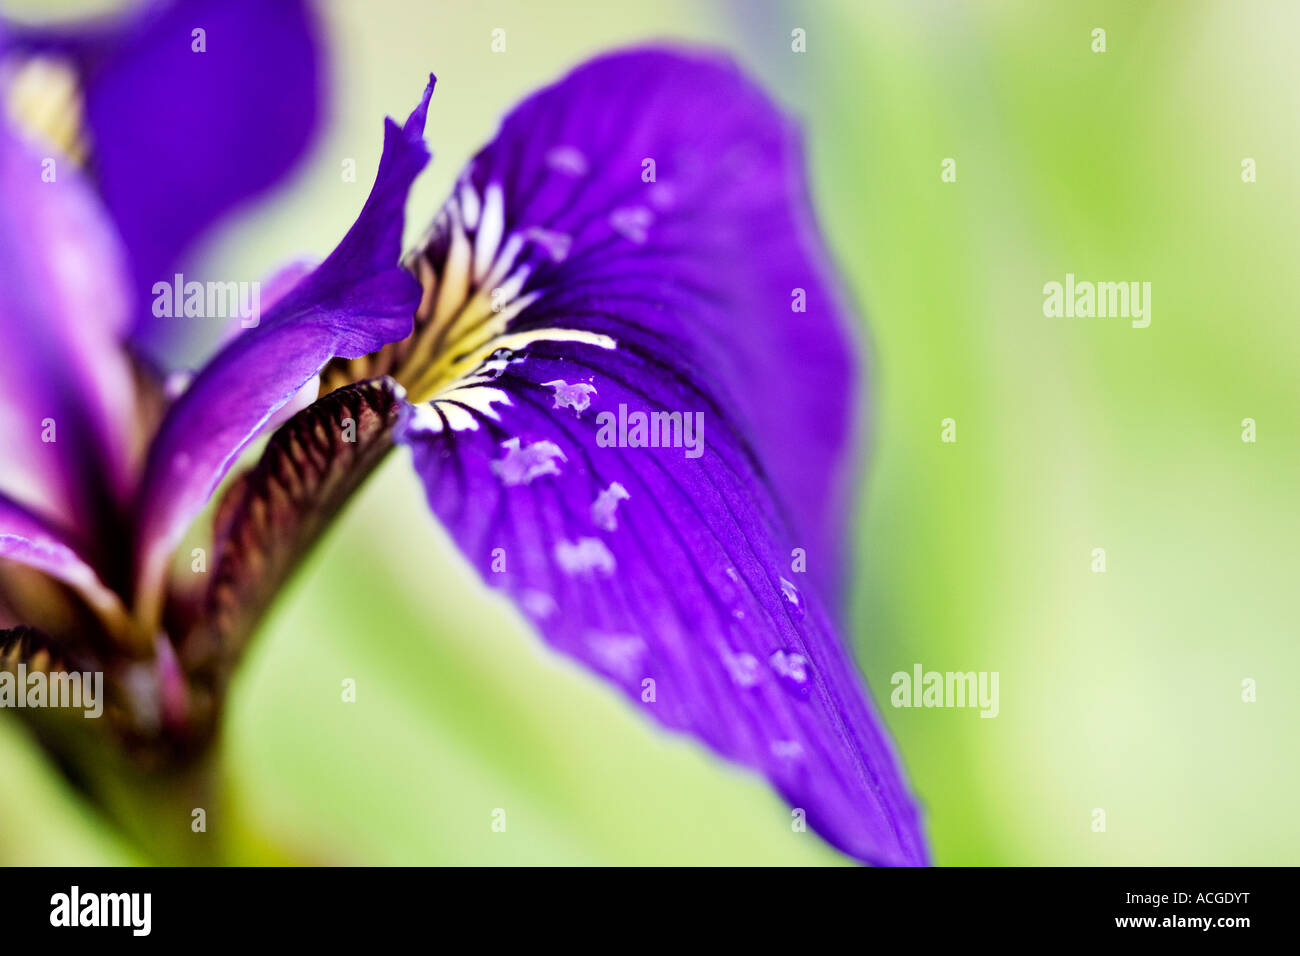 Iris sibirica siberian iris flower petals and water drops uk stock iris sibirica siberian iris flower petals and water drops uk izmirmasajfo